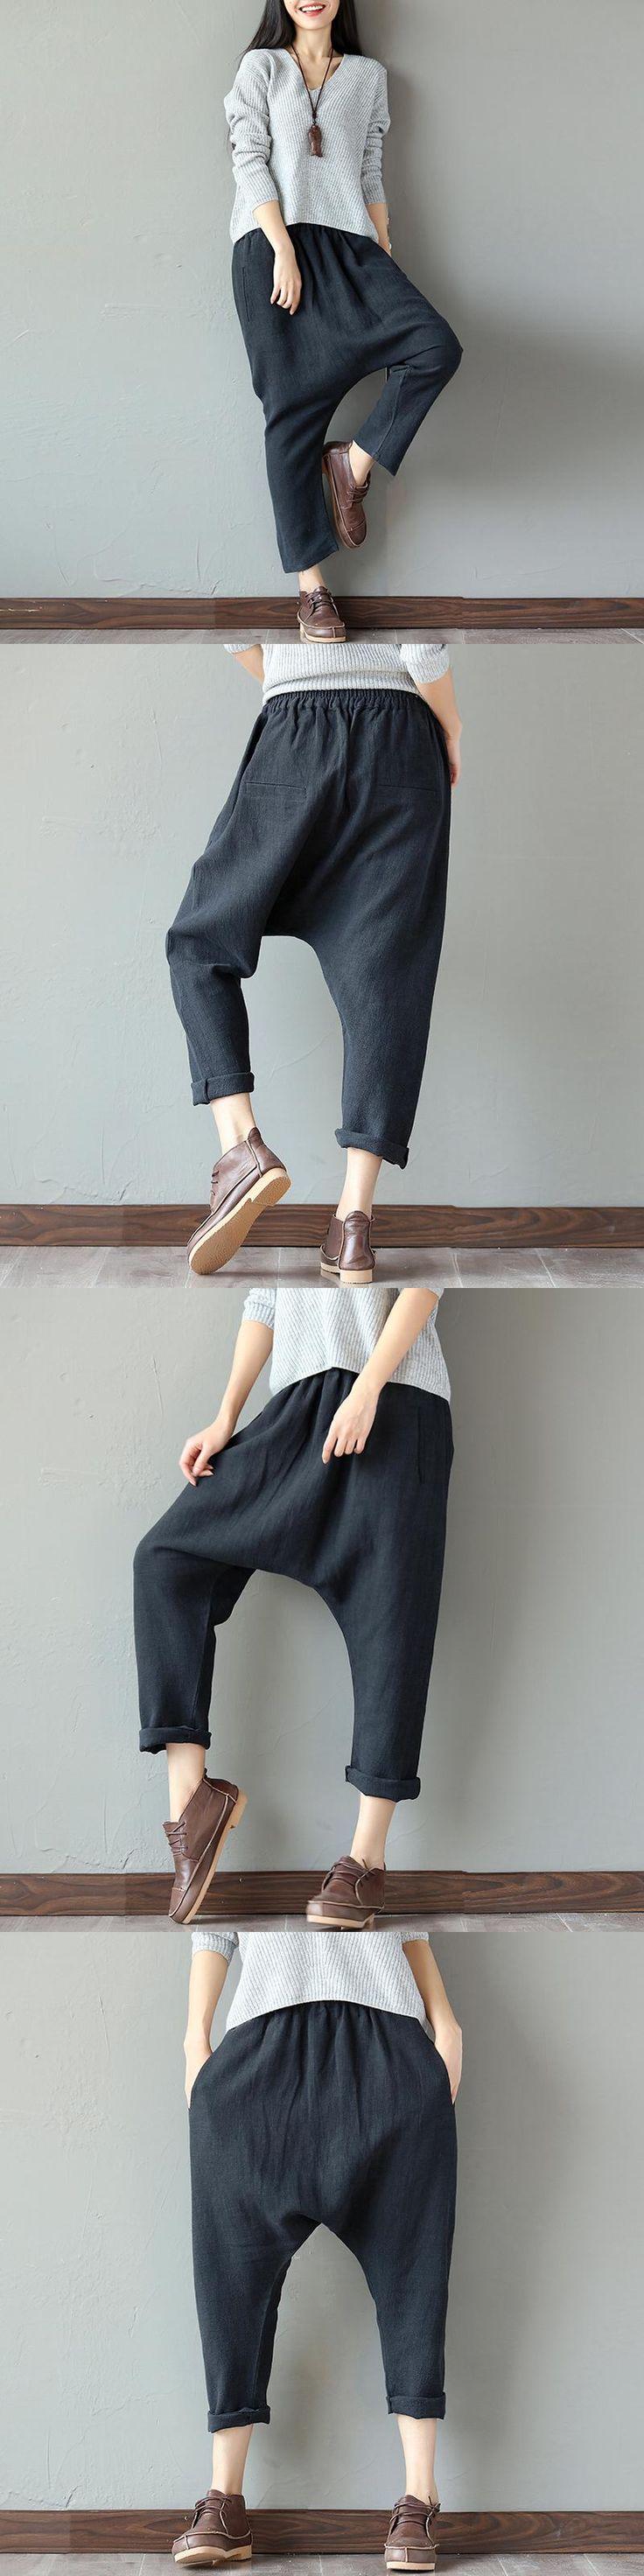 New 2017 Spring Summer Women Harem Pants Female Art Style Loose Trousers Ladies' Causal Cotton Linen Black Pants Y88